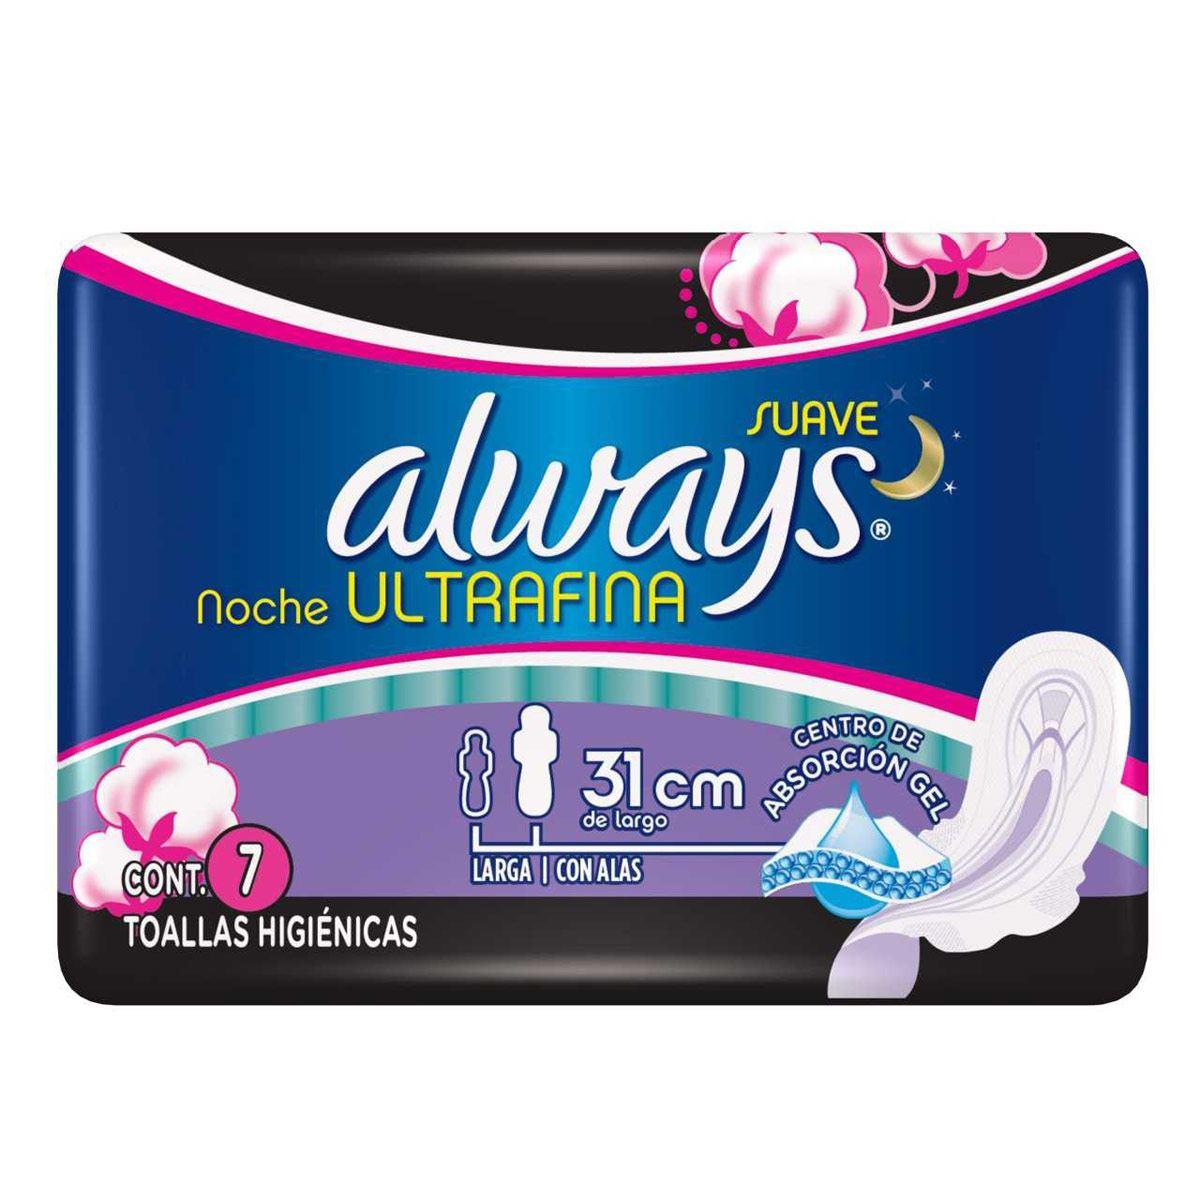 Toallas Sanitarias Ultra Fina Nocturna con alas con 7 Always